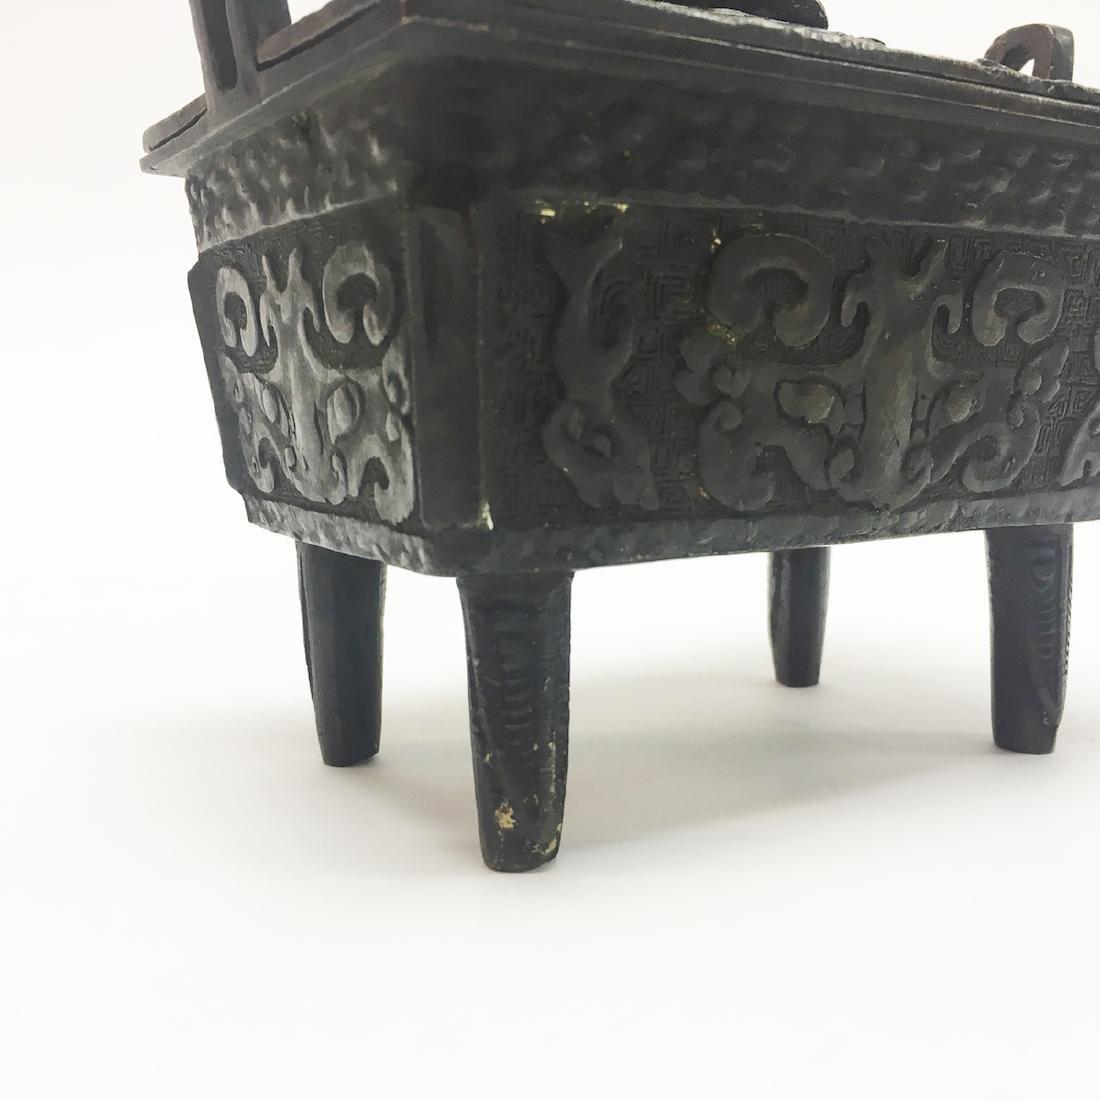 Chinese Bronze Incense Burner - 5